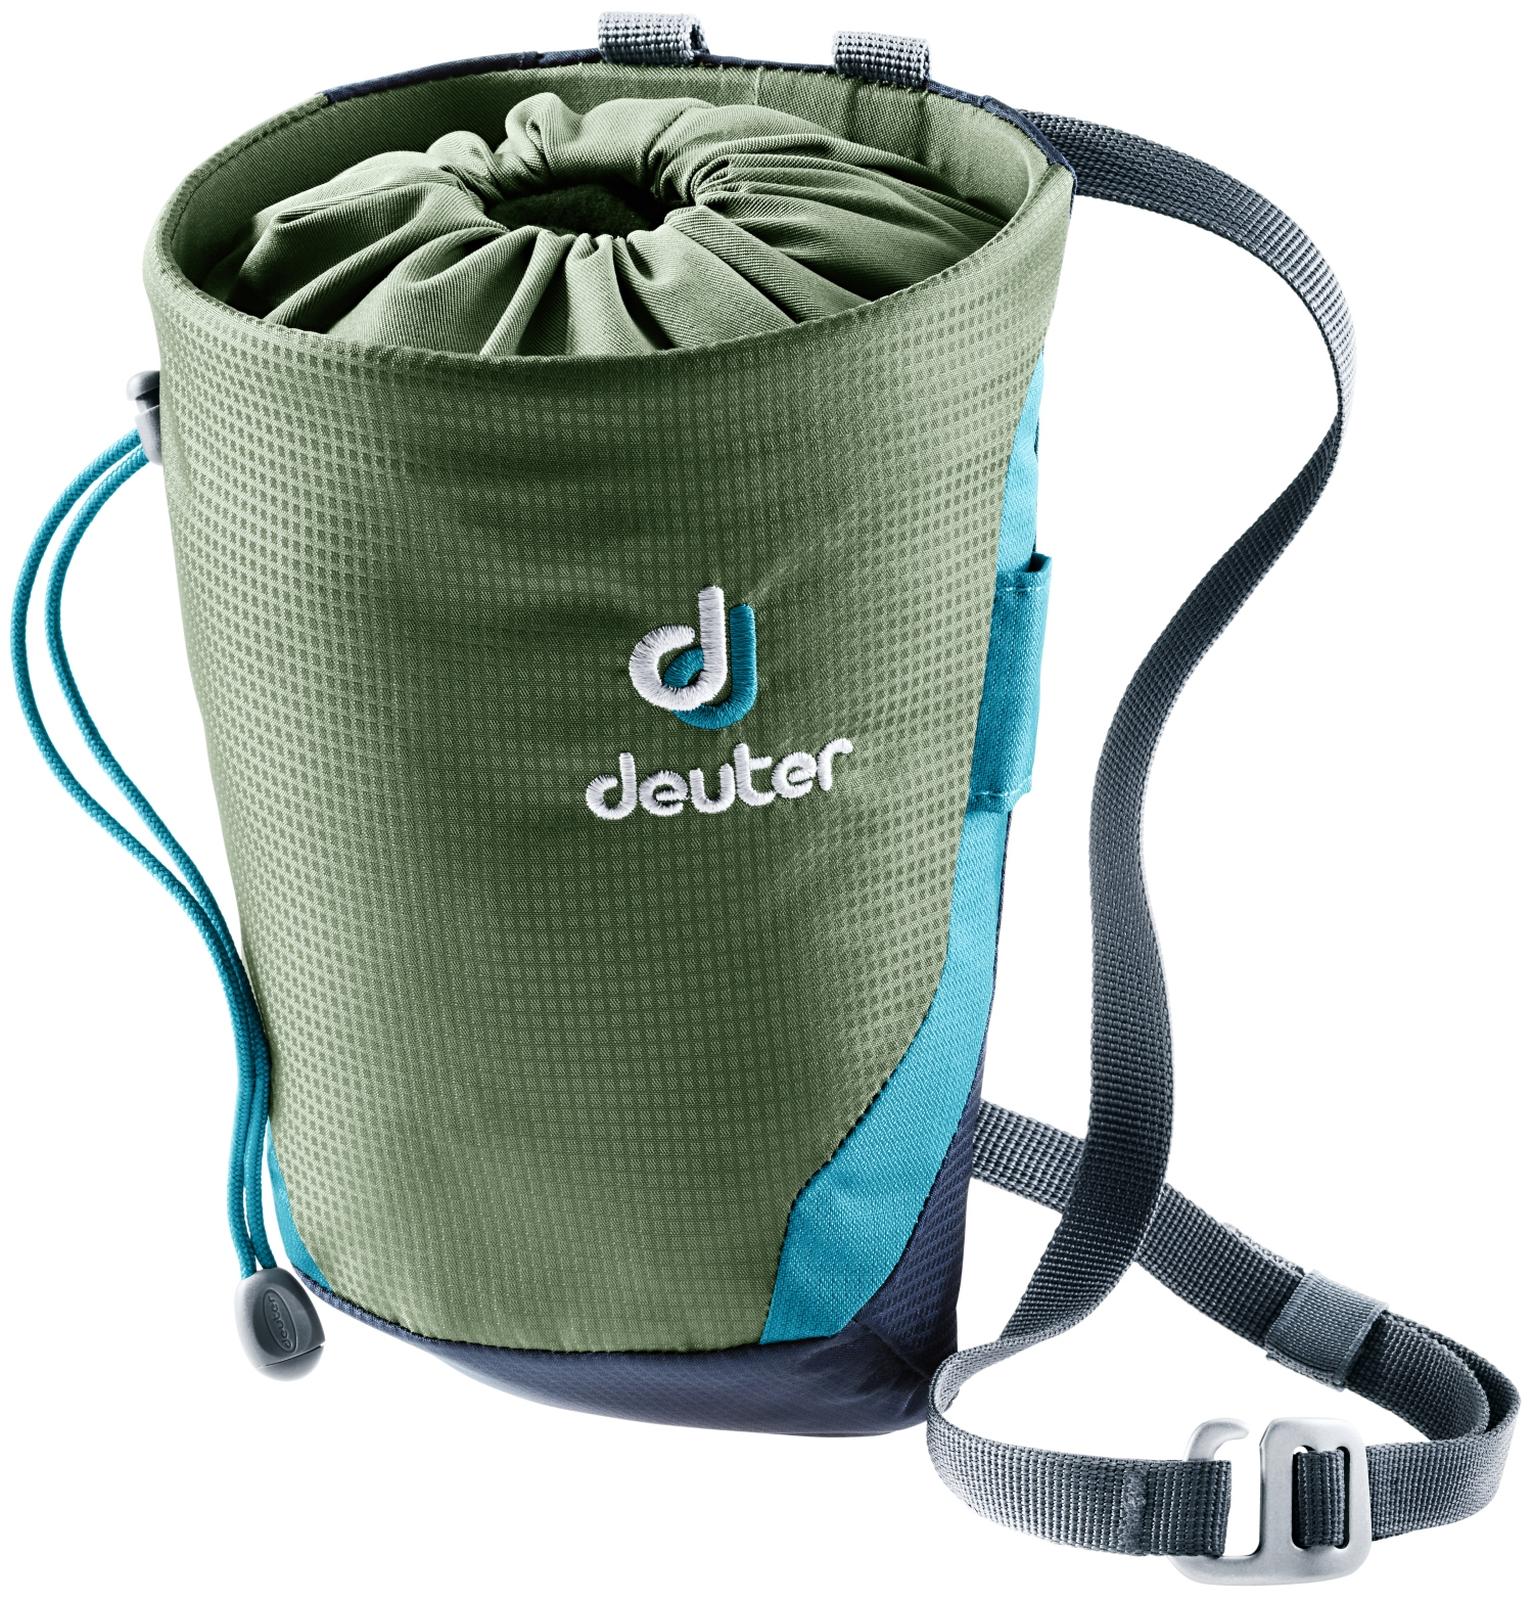 Мешок для магнезии Deuter Gravity Chalk Bag II L, цвет: темно-синий, оливковый